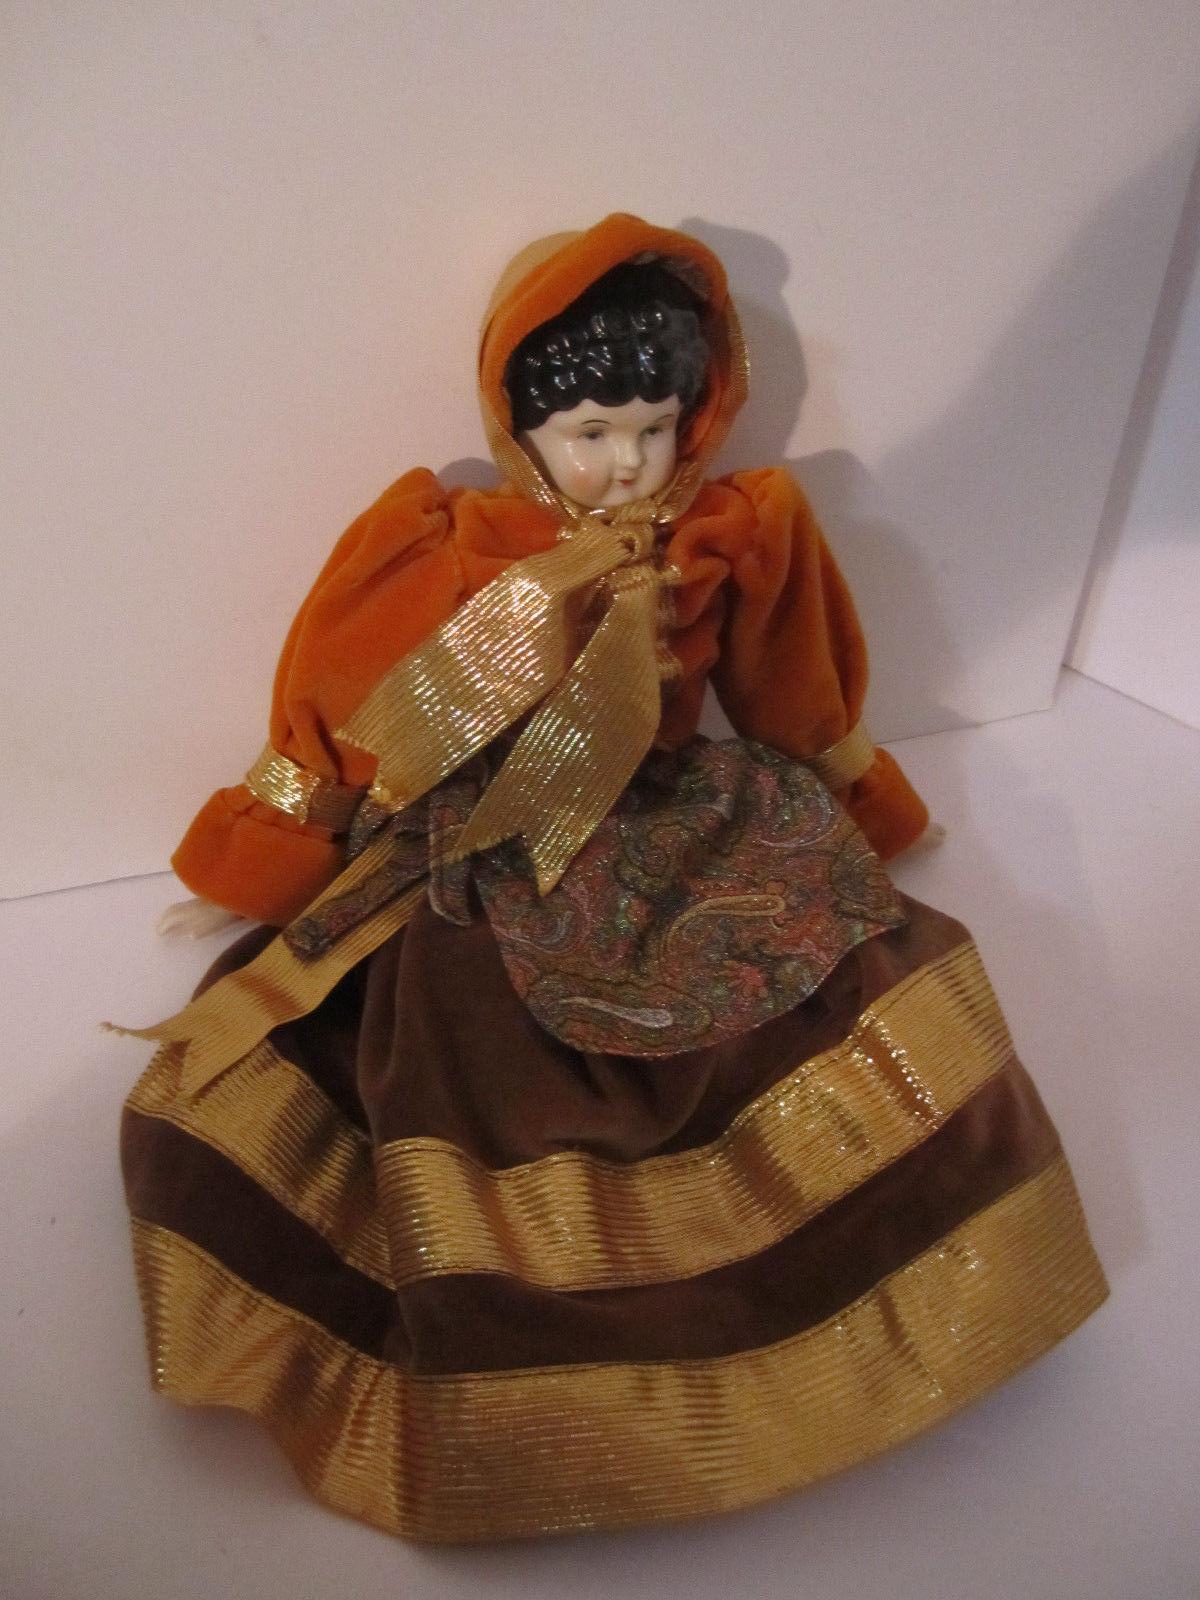 Elegant Repro Porcelain Brunette Doll Orange & Paisley Dress GORGEOUS!